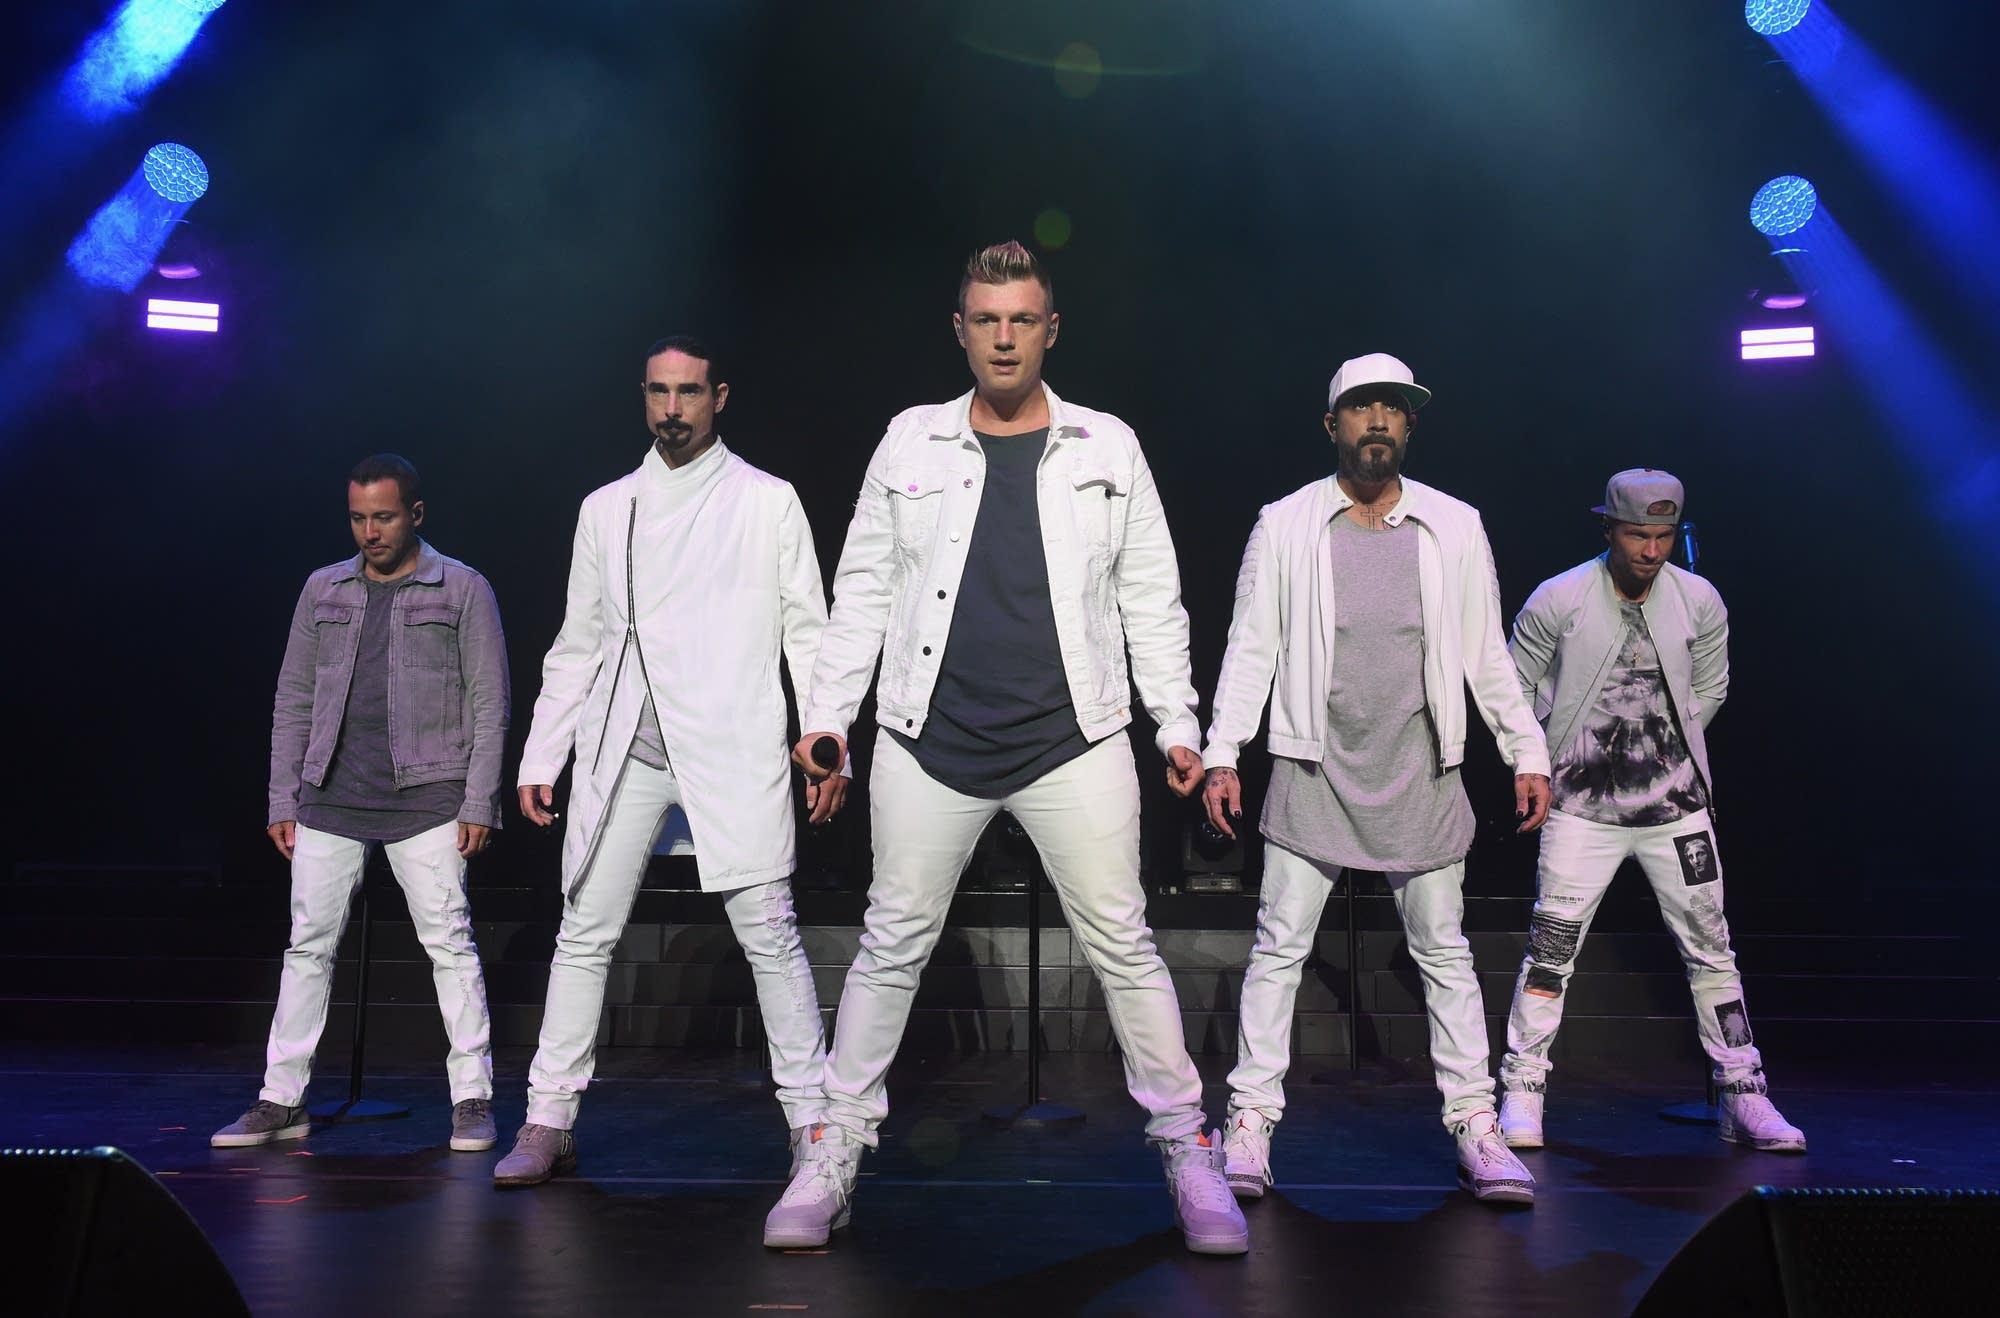 Backstreet Boys in concert